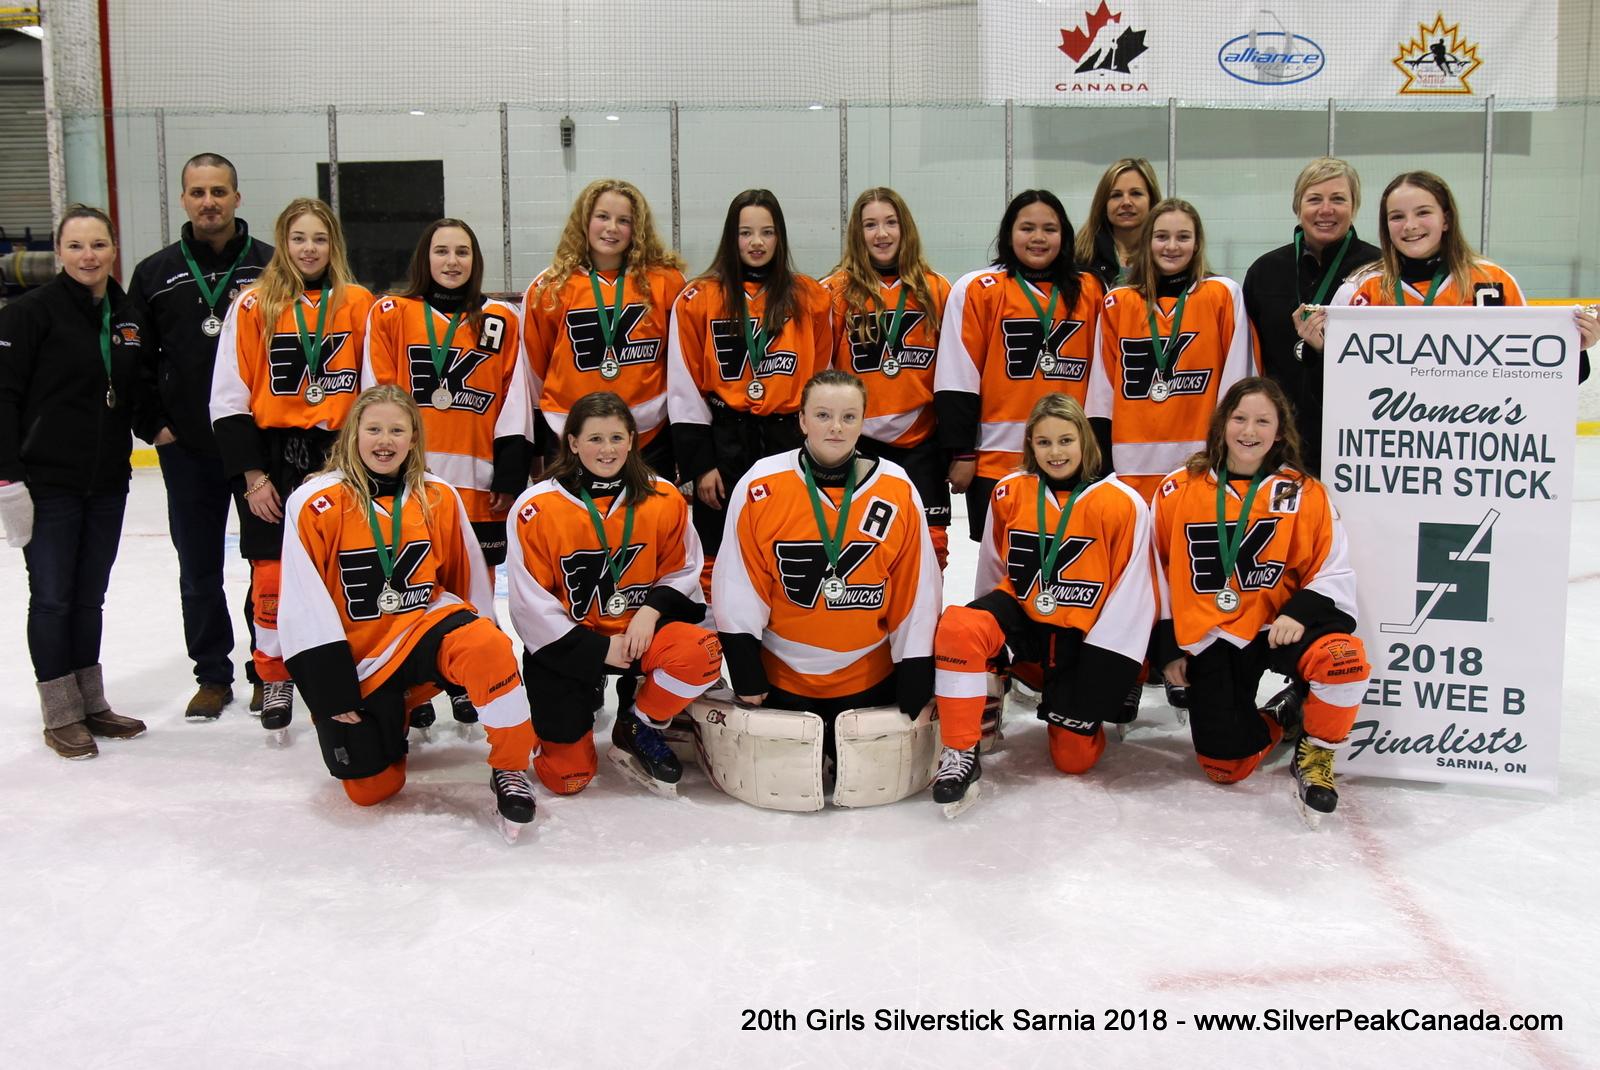 silverpeak studios canada girls silverstick sarnia ontario 2018 (12)